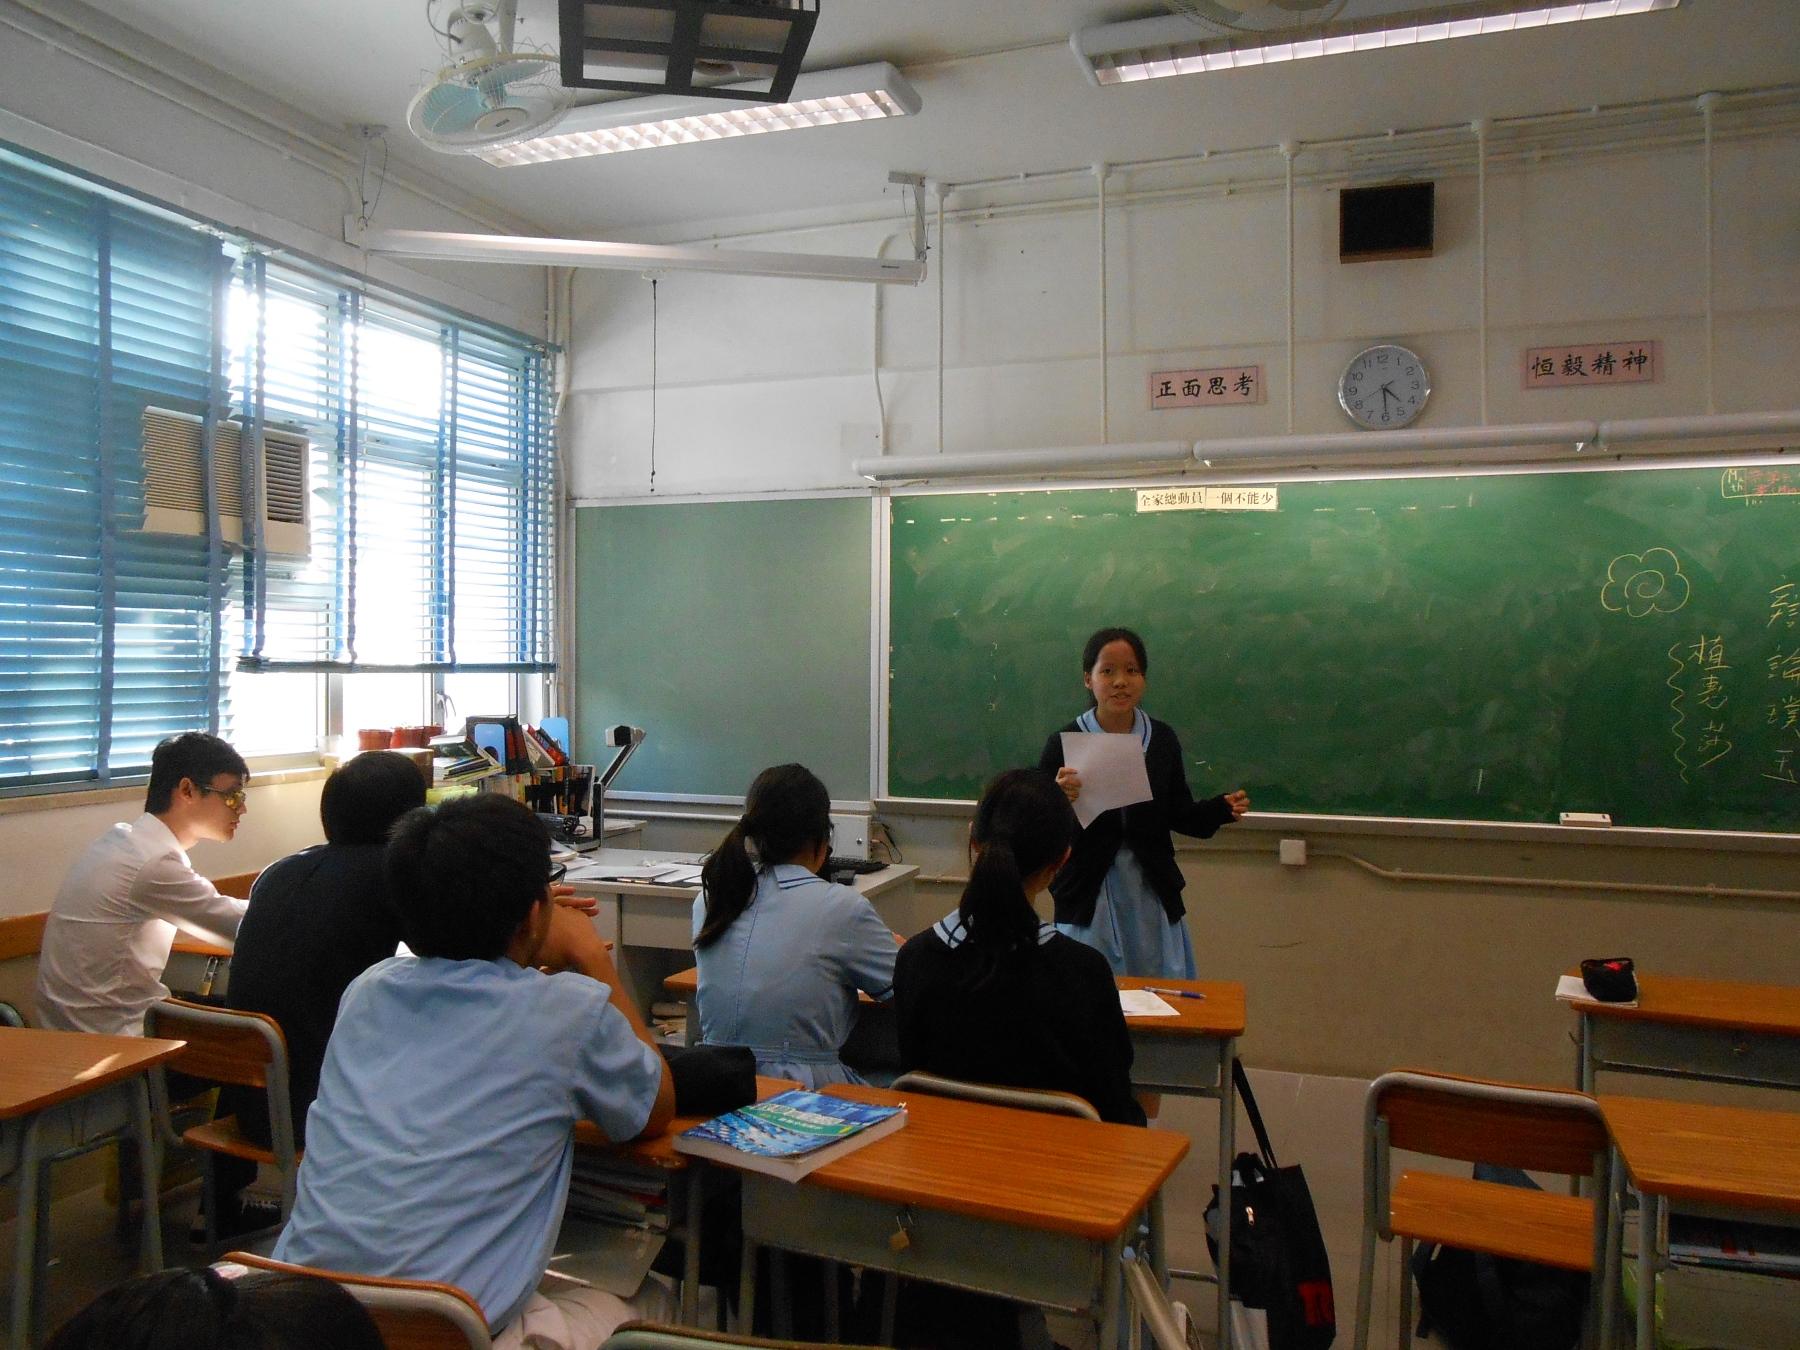 http://npc.edu.hk/sites/default/files/dscn9096.jpg